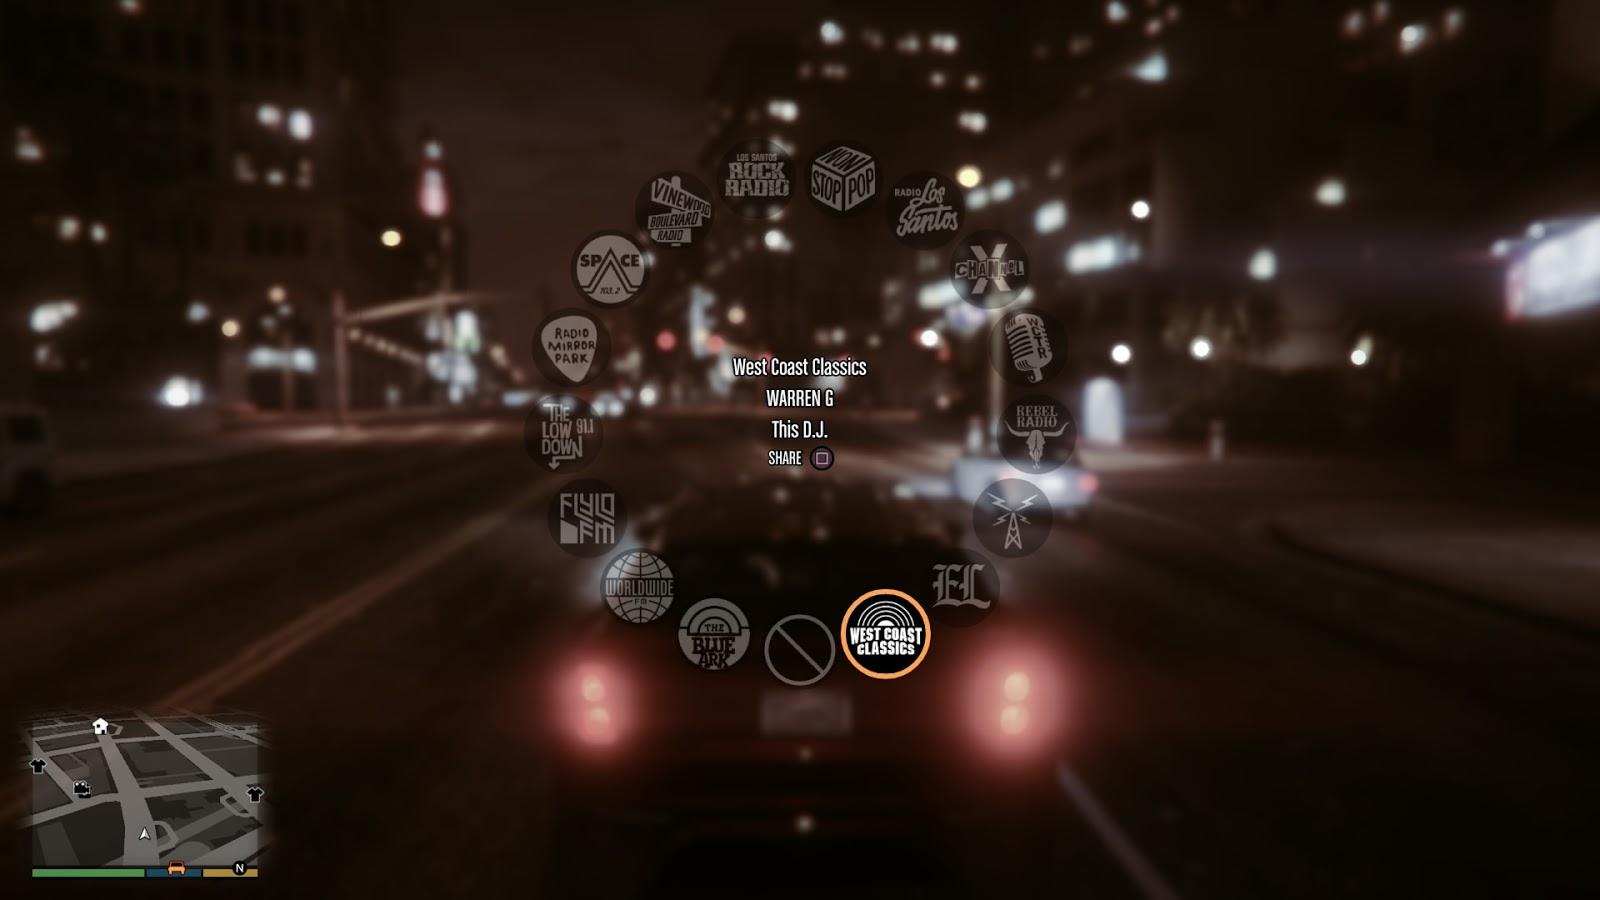 FTVMS 323 blog: Music playback technologies in GTA 5